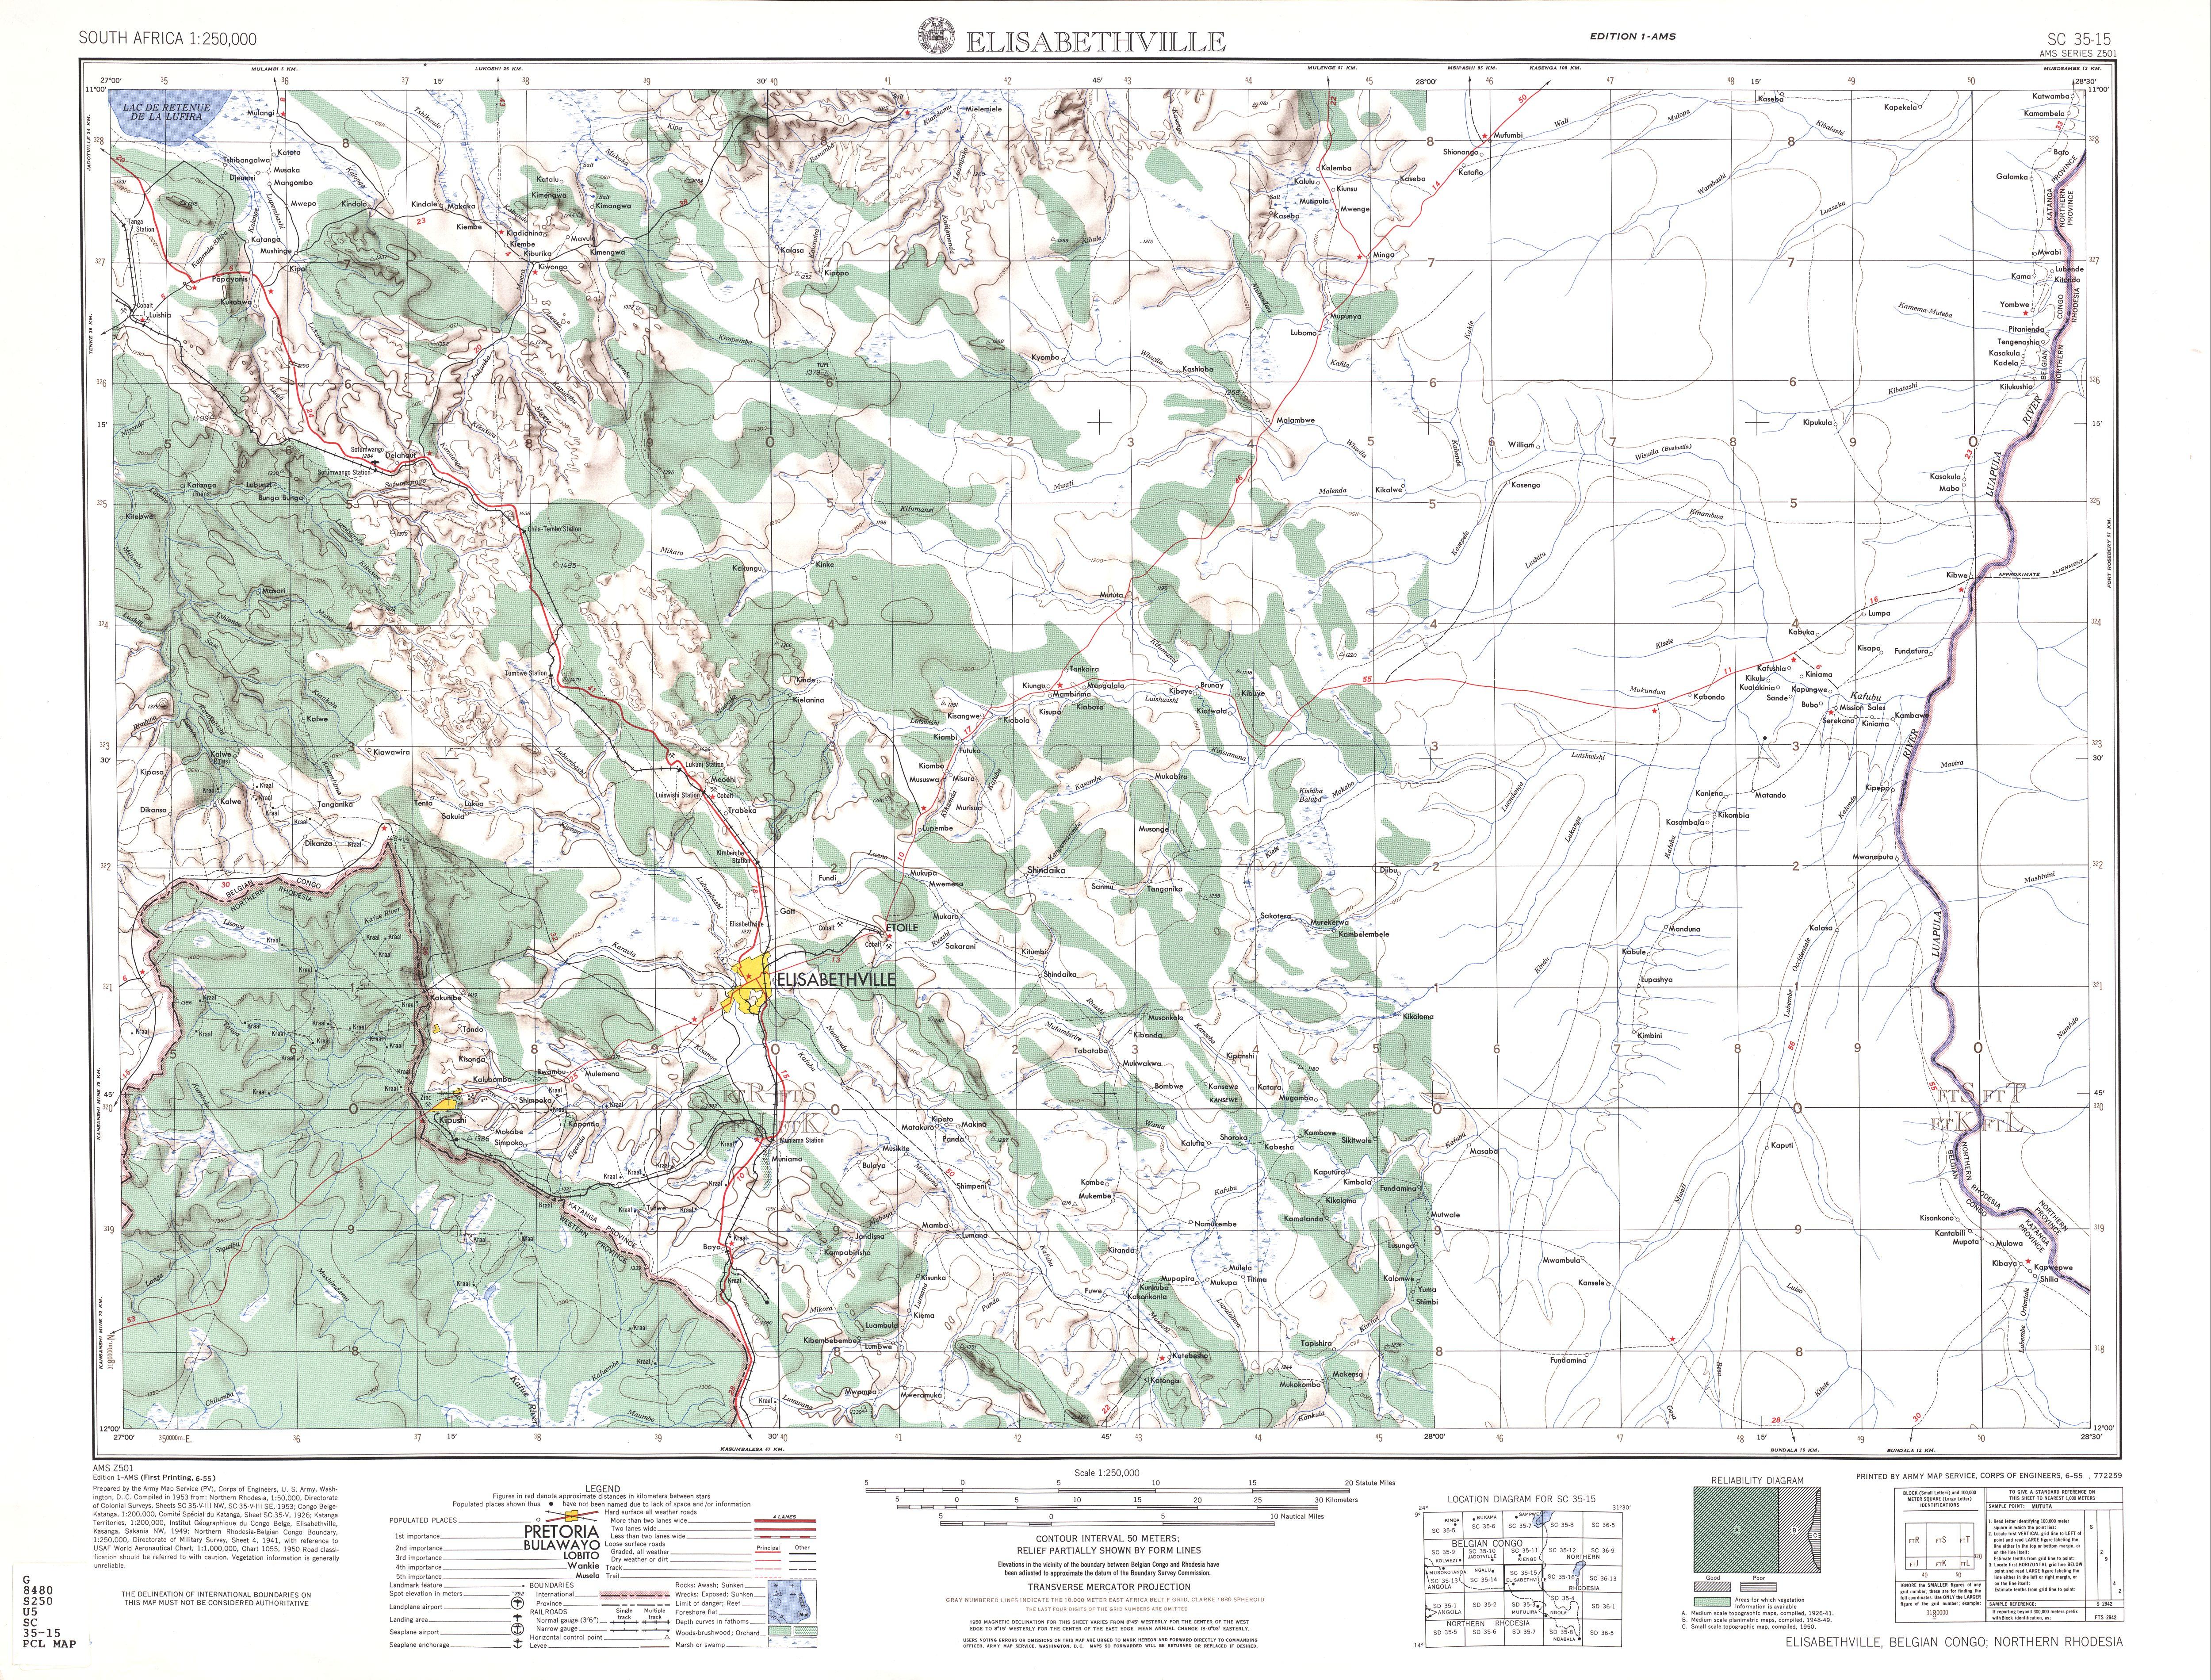 Elisabethville Topographic Map Sheet, Southern Africa 1954